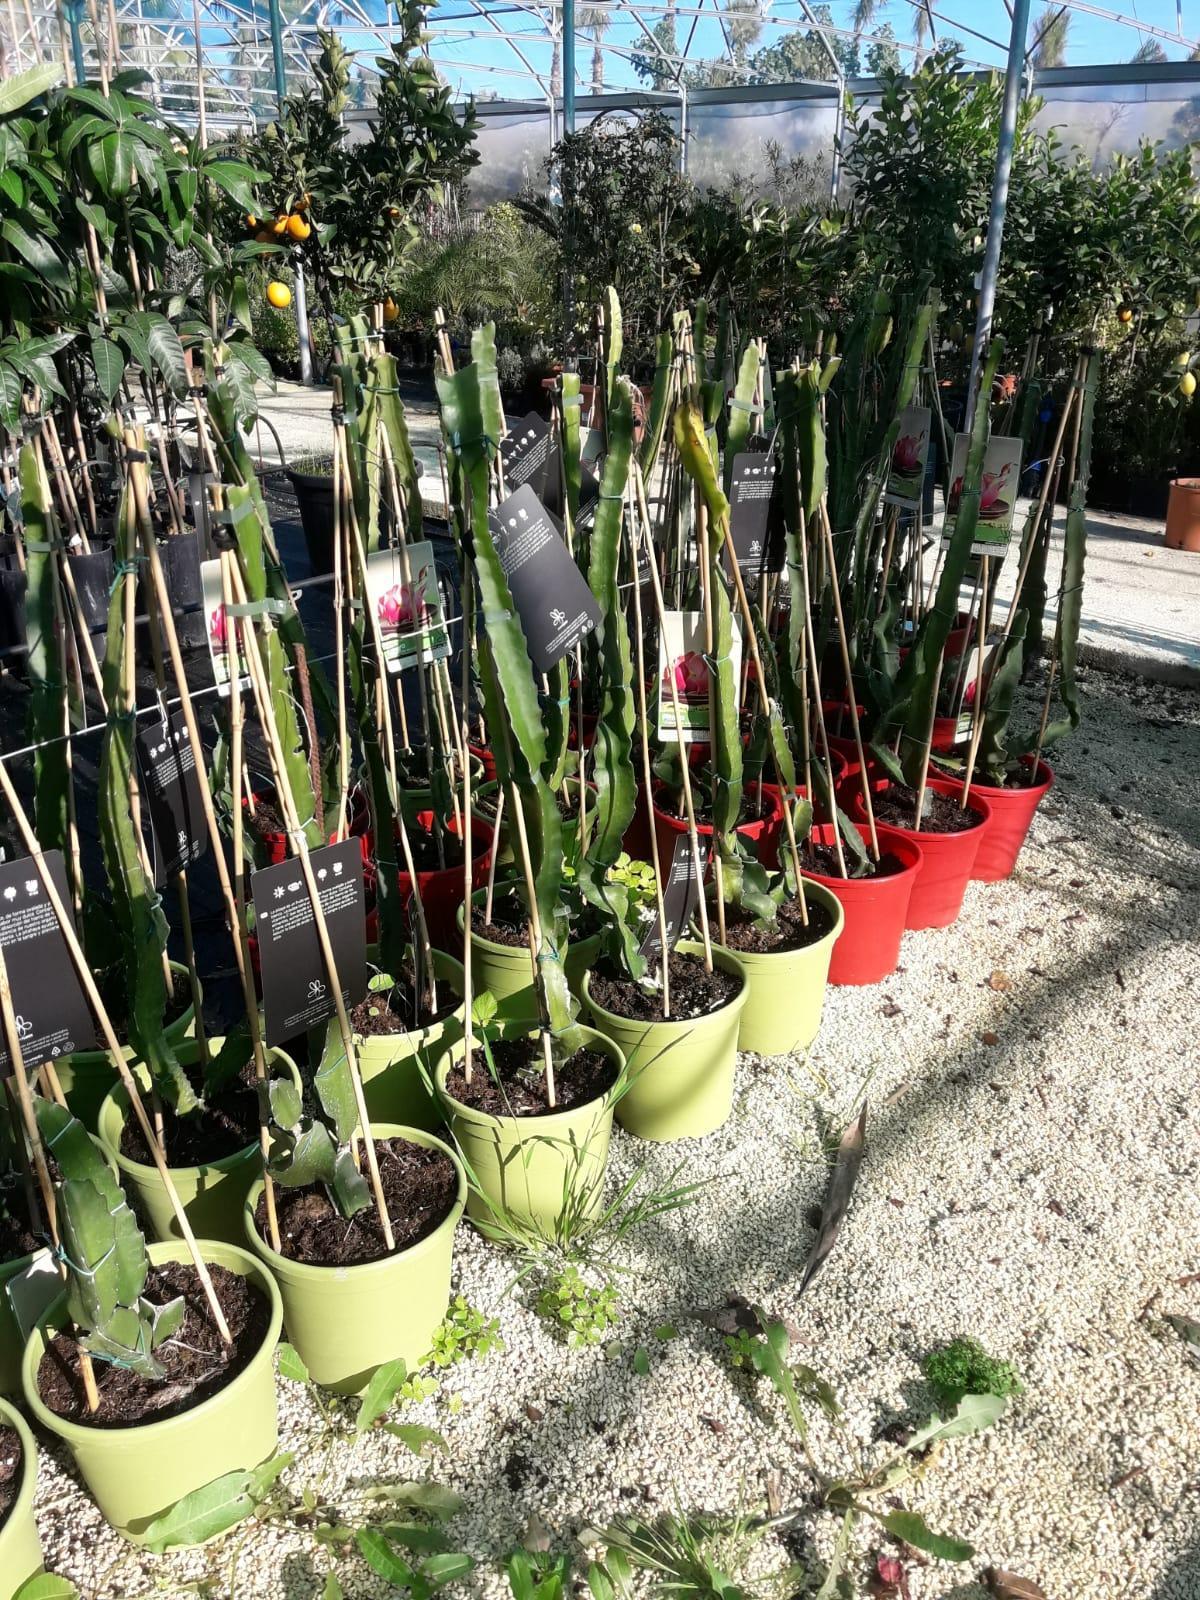 Piante Tropicali Da Interno pitaya rossa in vaso pitaya pianta tropicale rossa a polpa